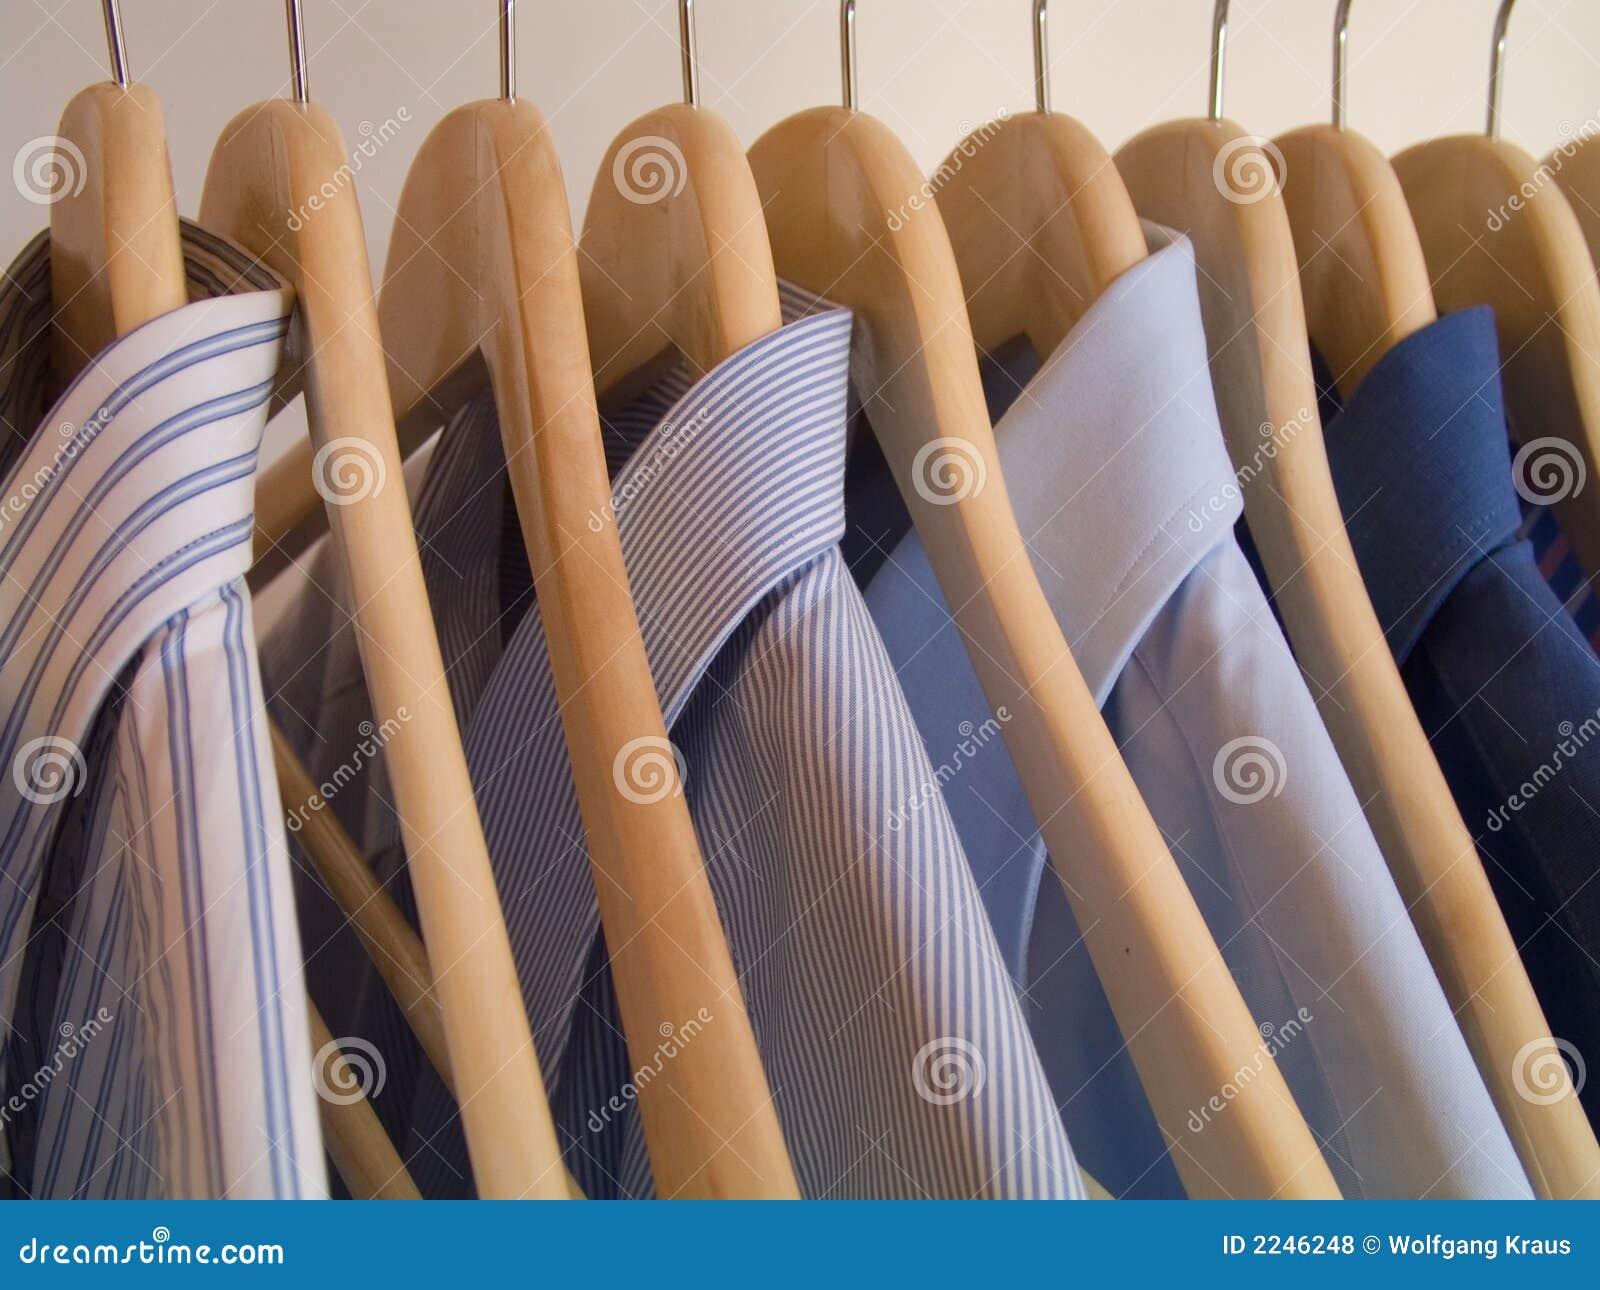 Clothes hanger stock photo image of closeup blue shirt for Clothespin photo hanger